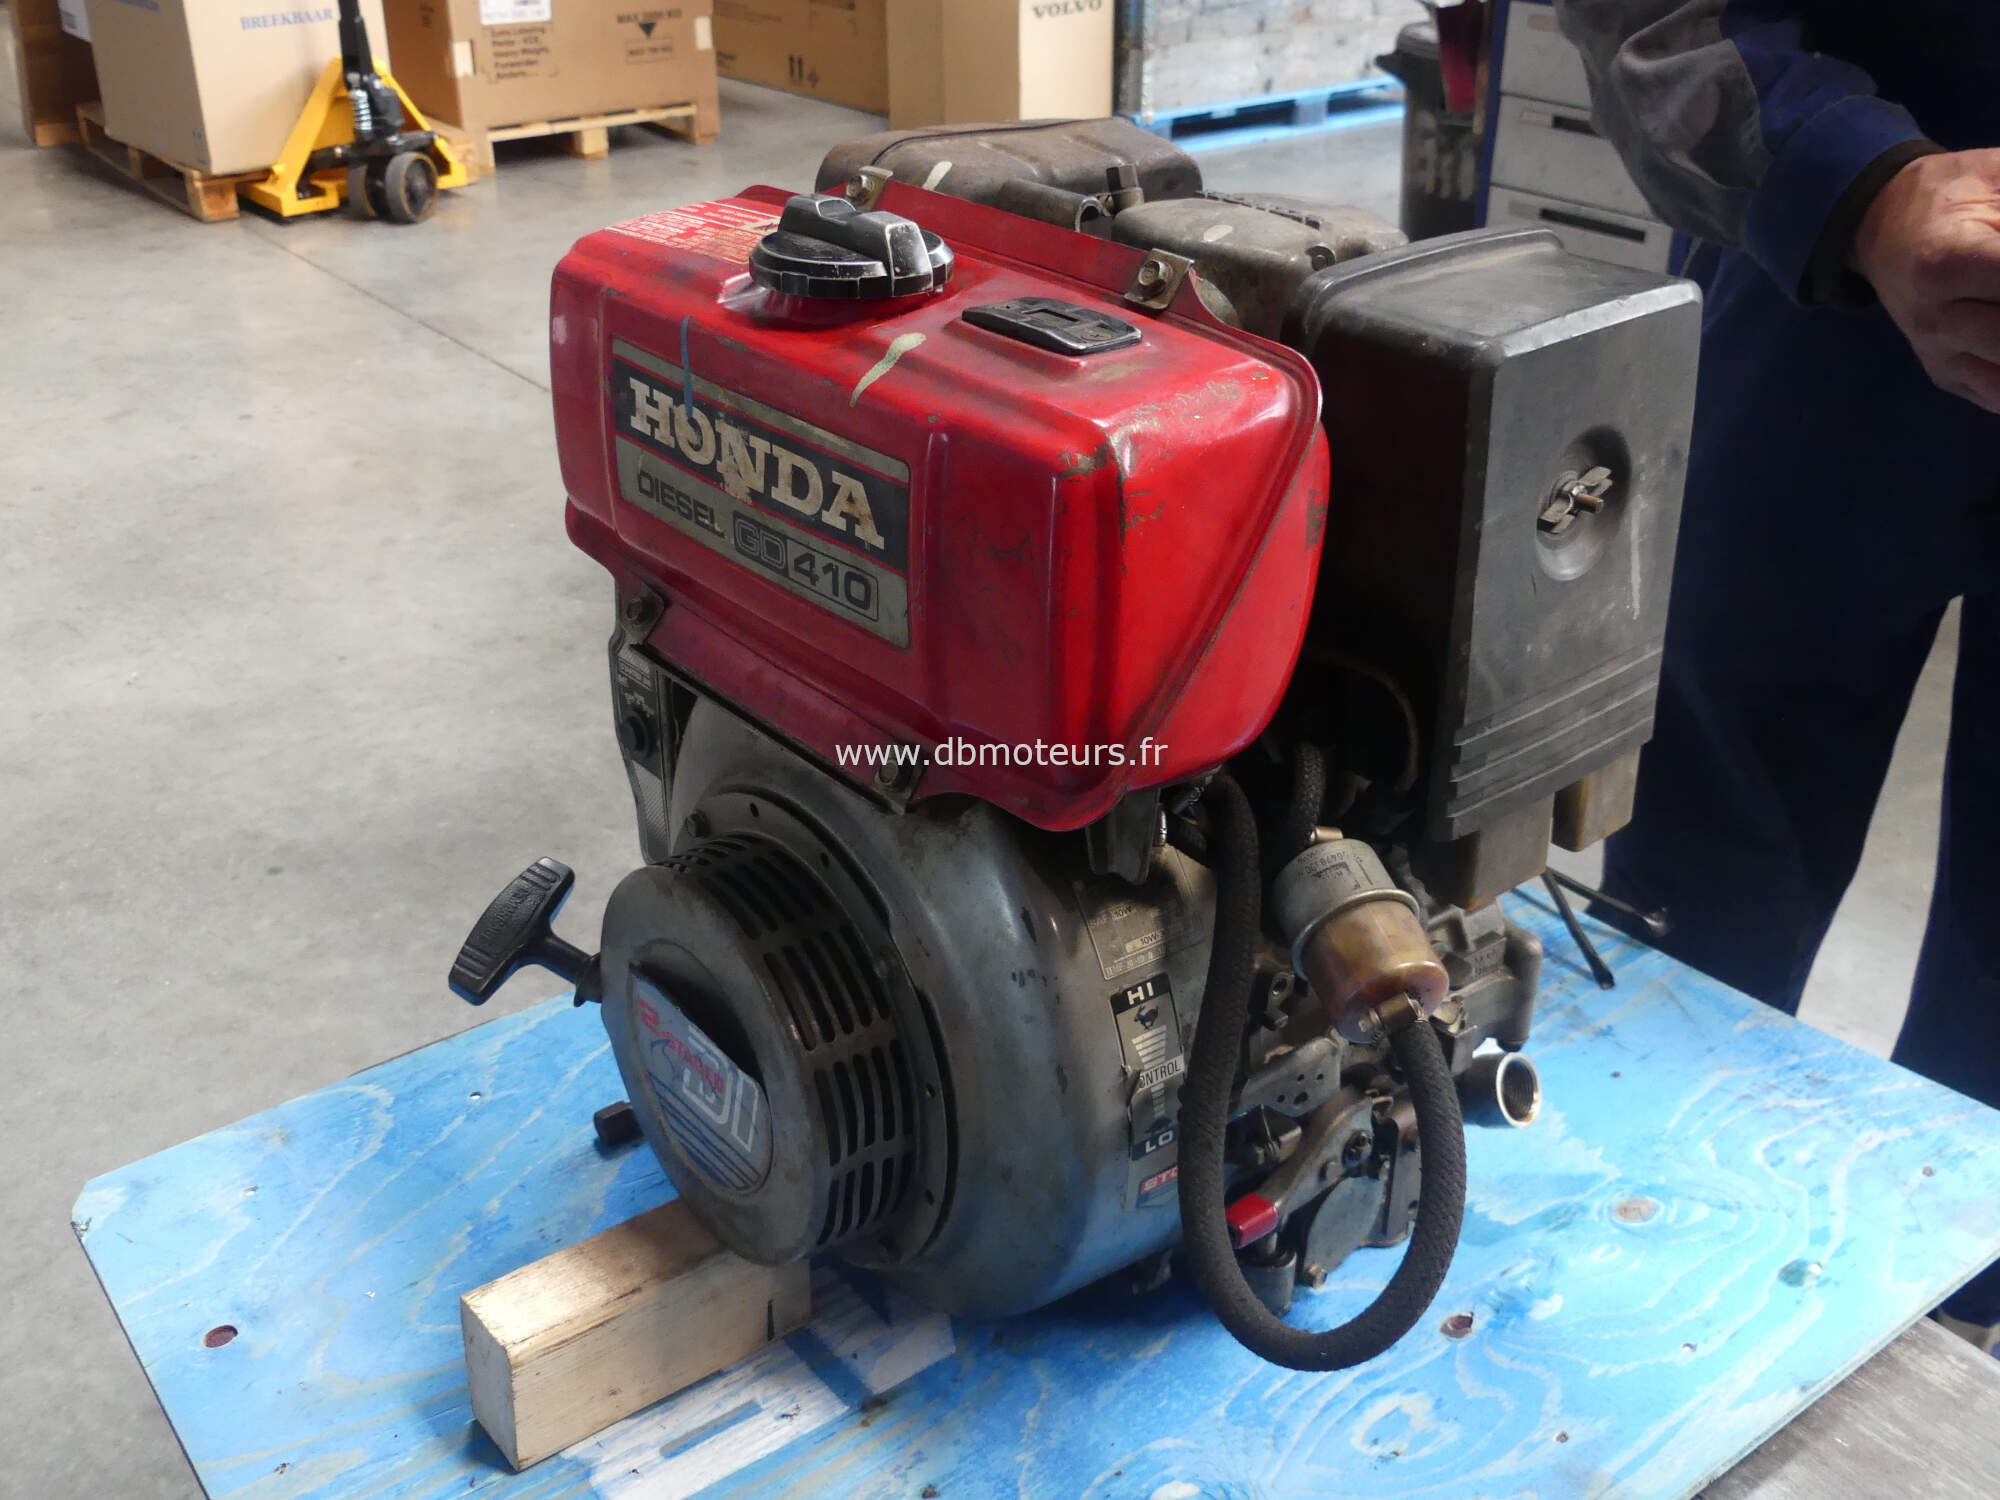 honda-gd410-diesel-motoculture